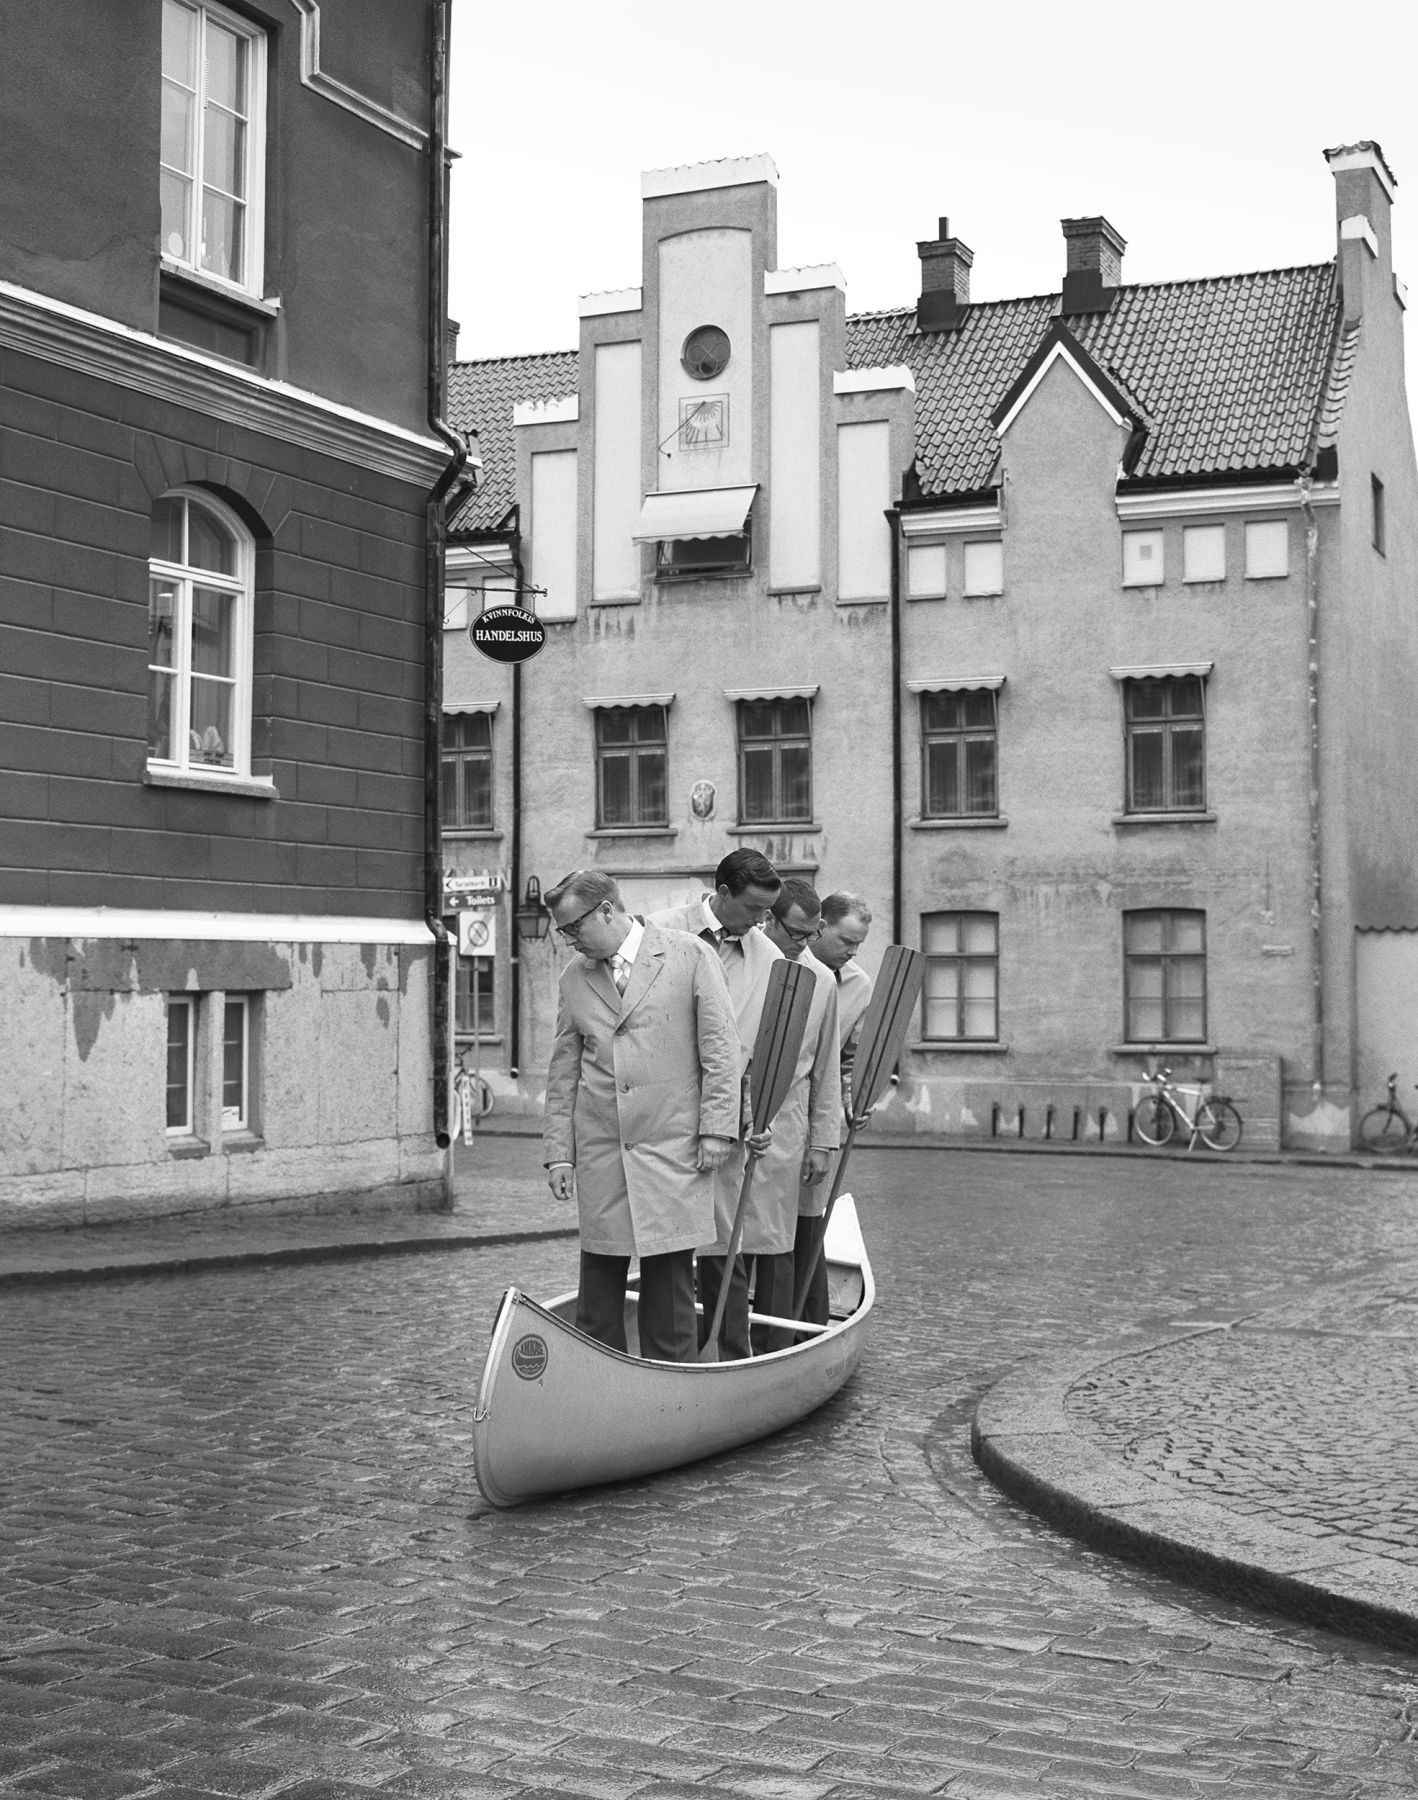 Four Men Waiting in Canoe, Gotland, 2000, Archival Pigment Print